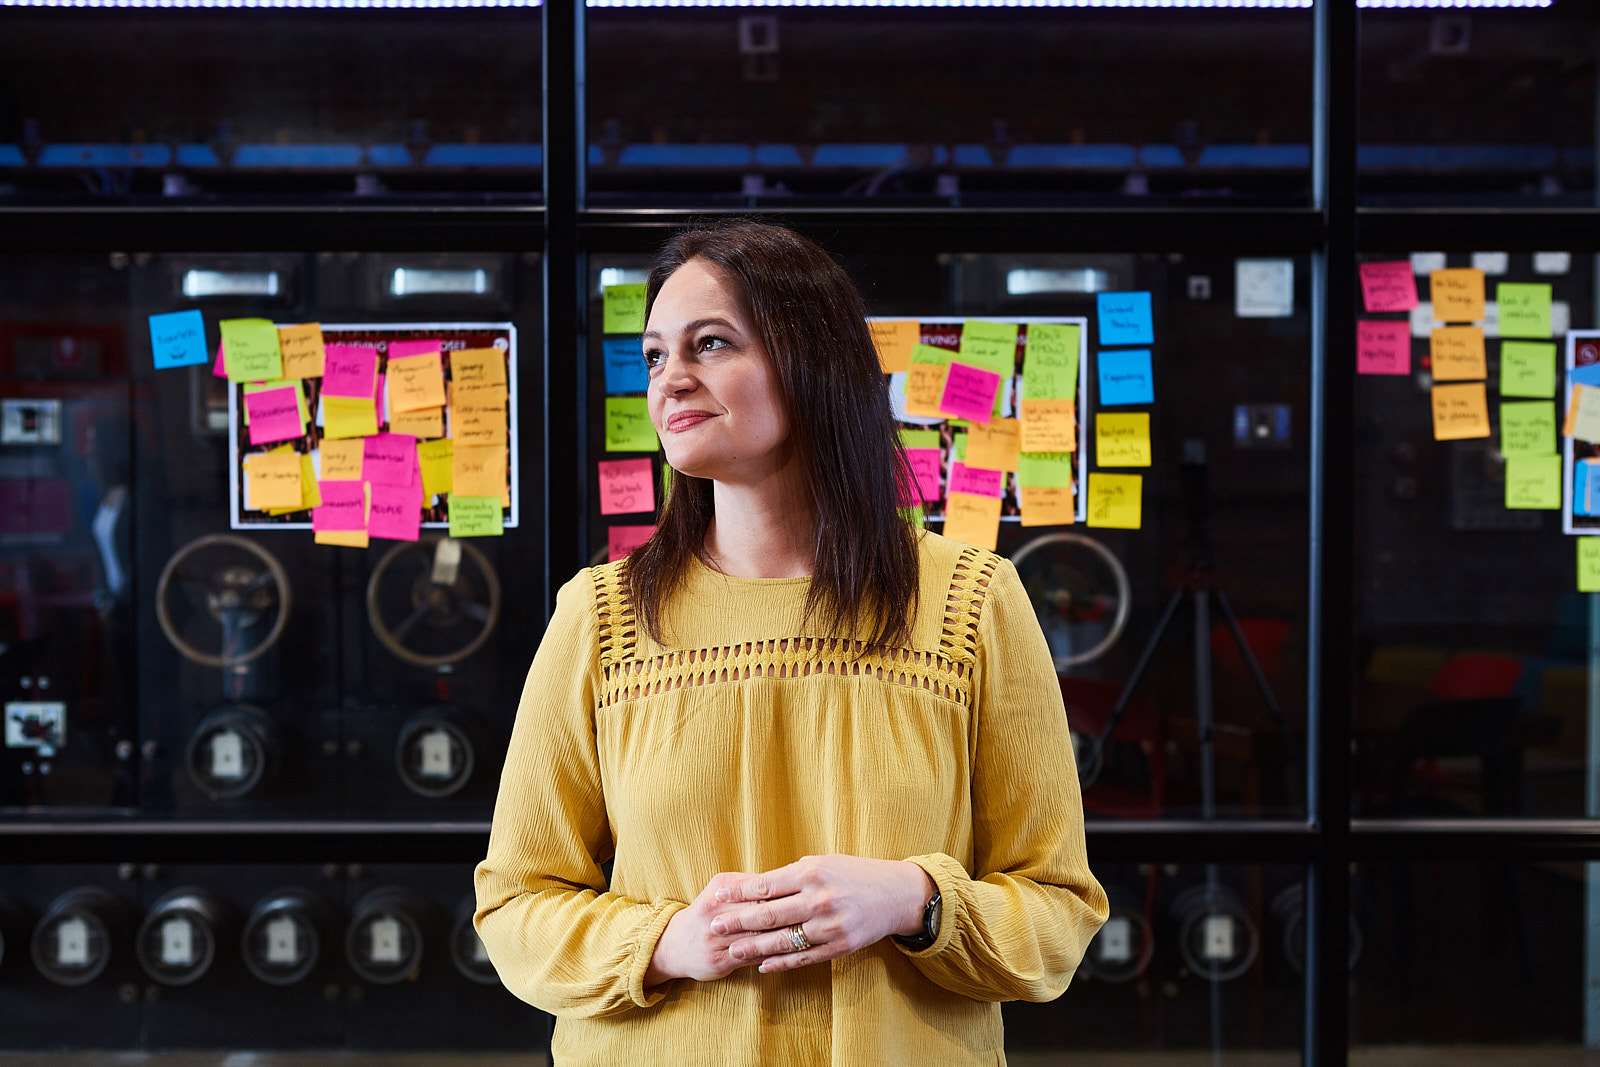 Kate O'Halloran G2 Innovation